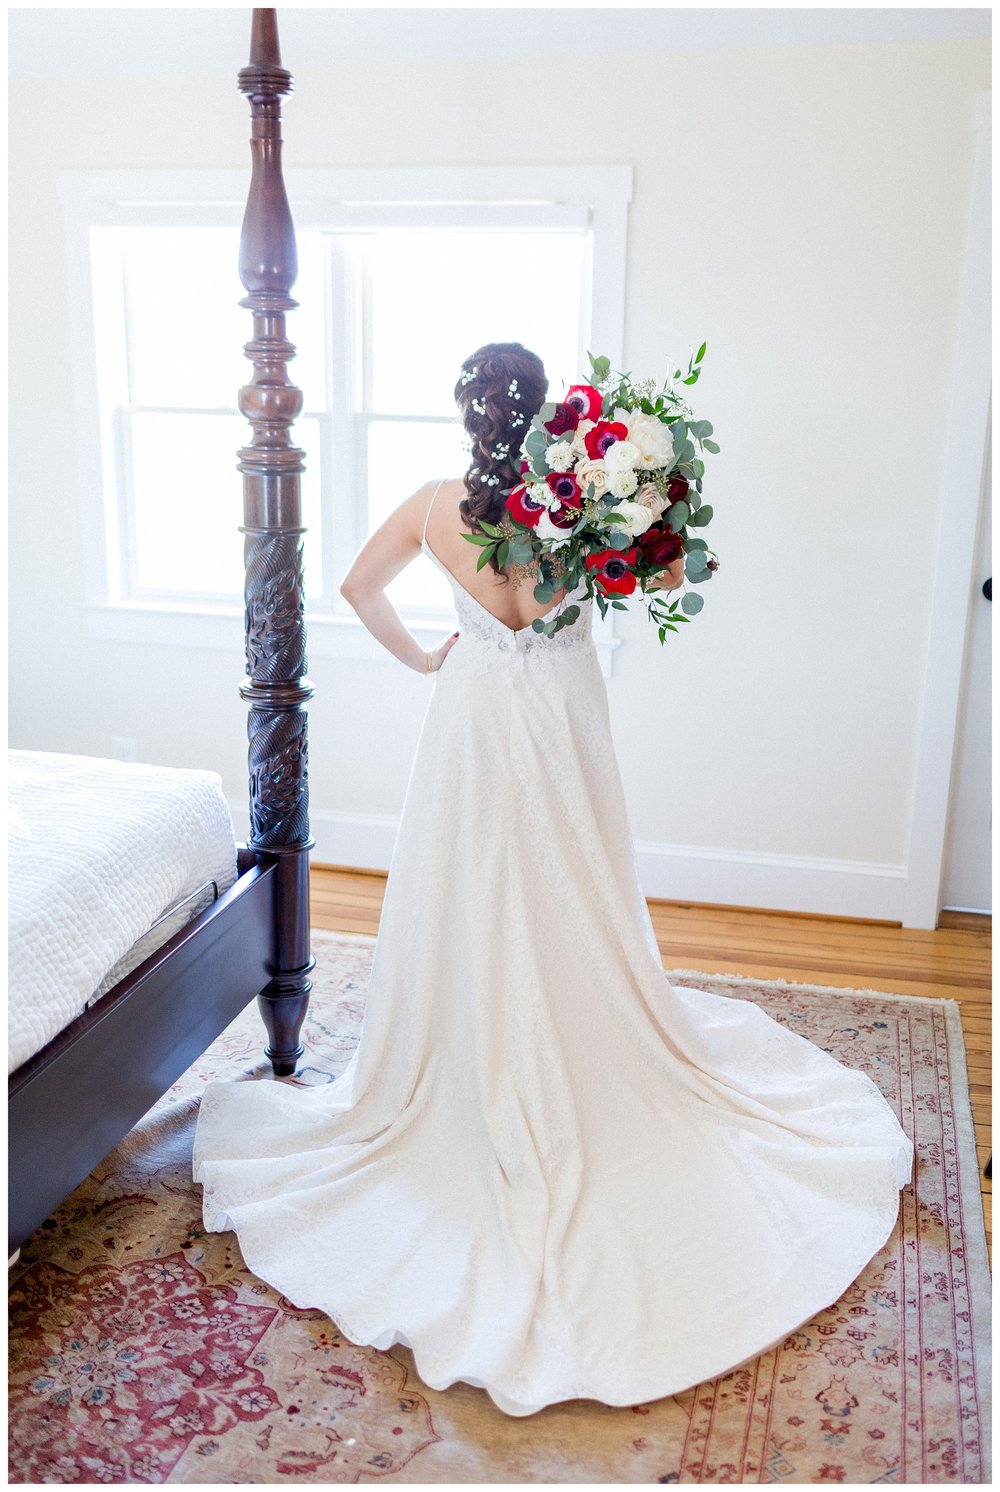 Stone Tower Winery Wedding | Virginia Winter Wedding | VA Wedding Photographer Kir Tuben_0025.jpg